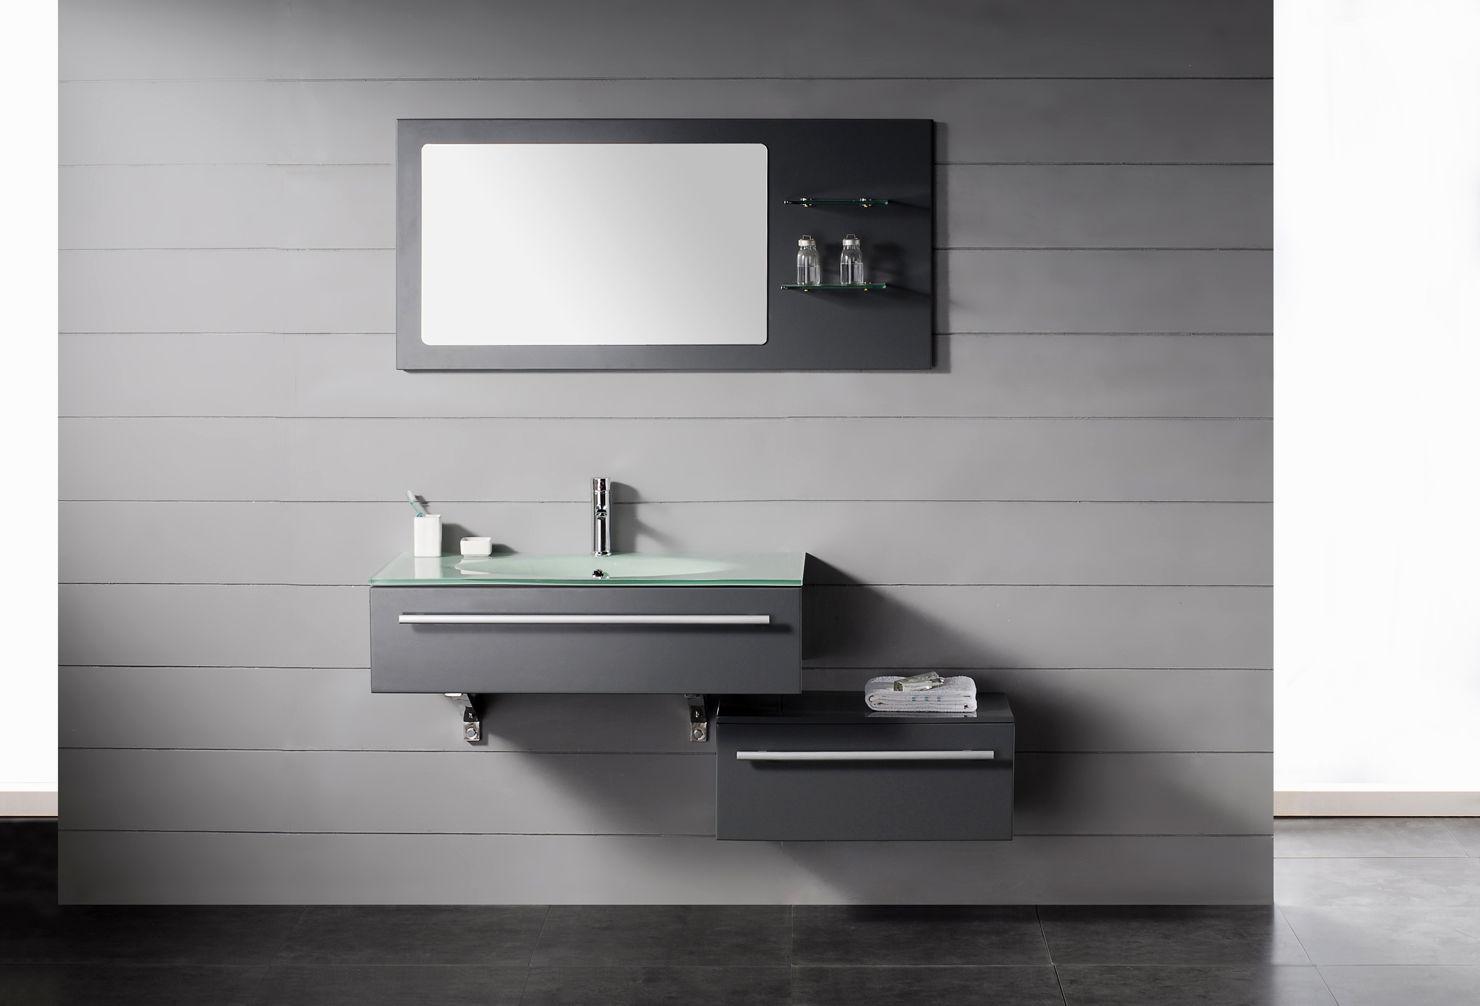 fancy bathroom vanities for sale gallery-Unique Bathroom Vanities for Sale Ideas